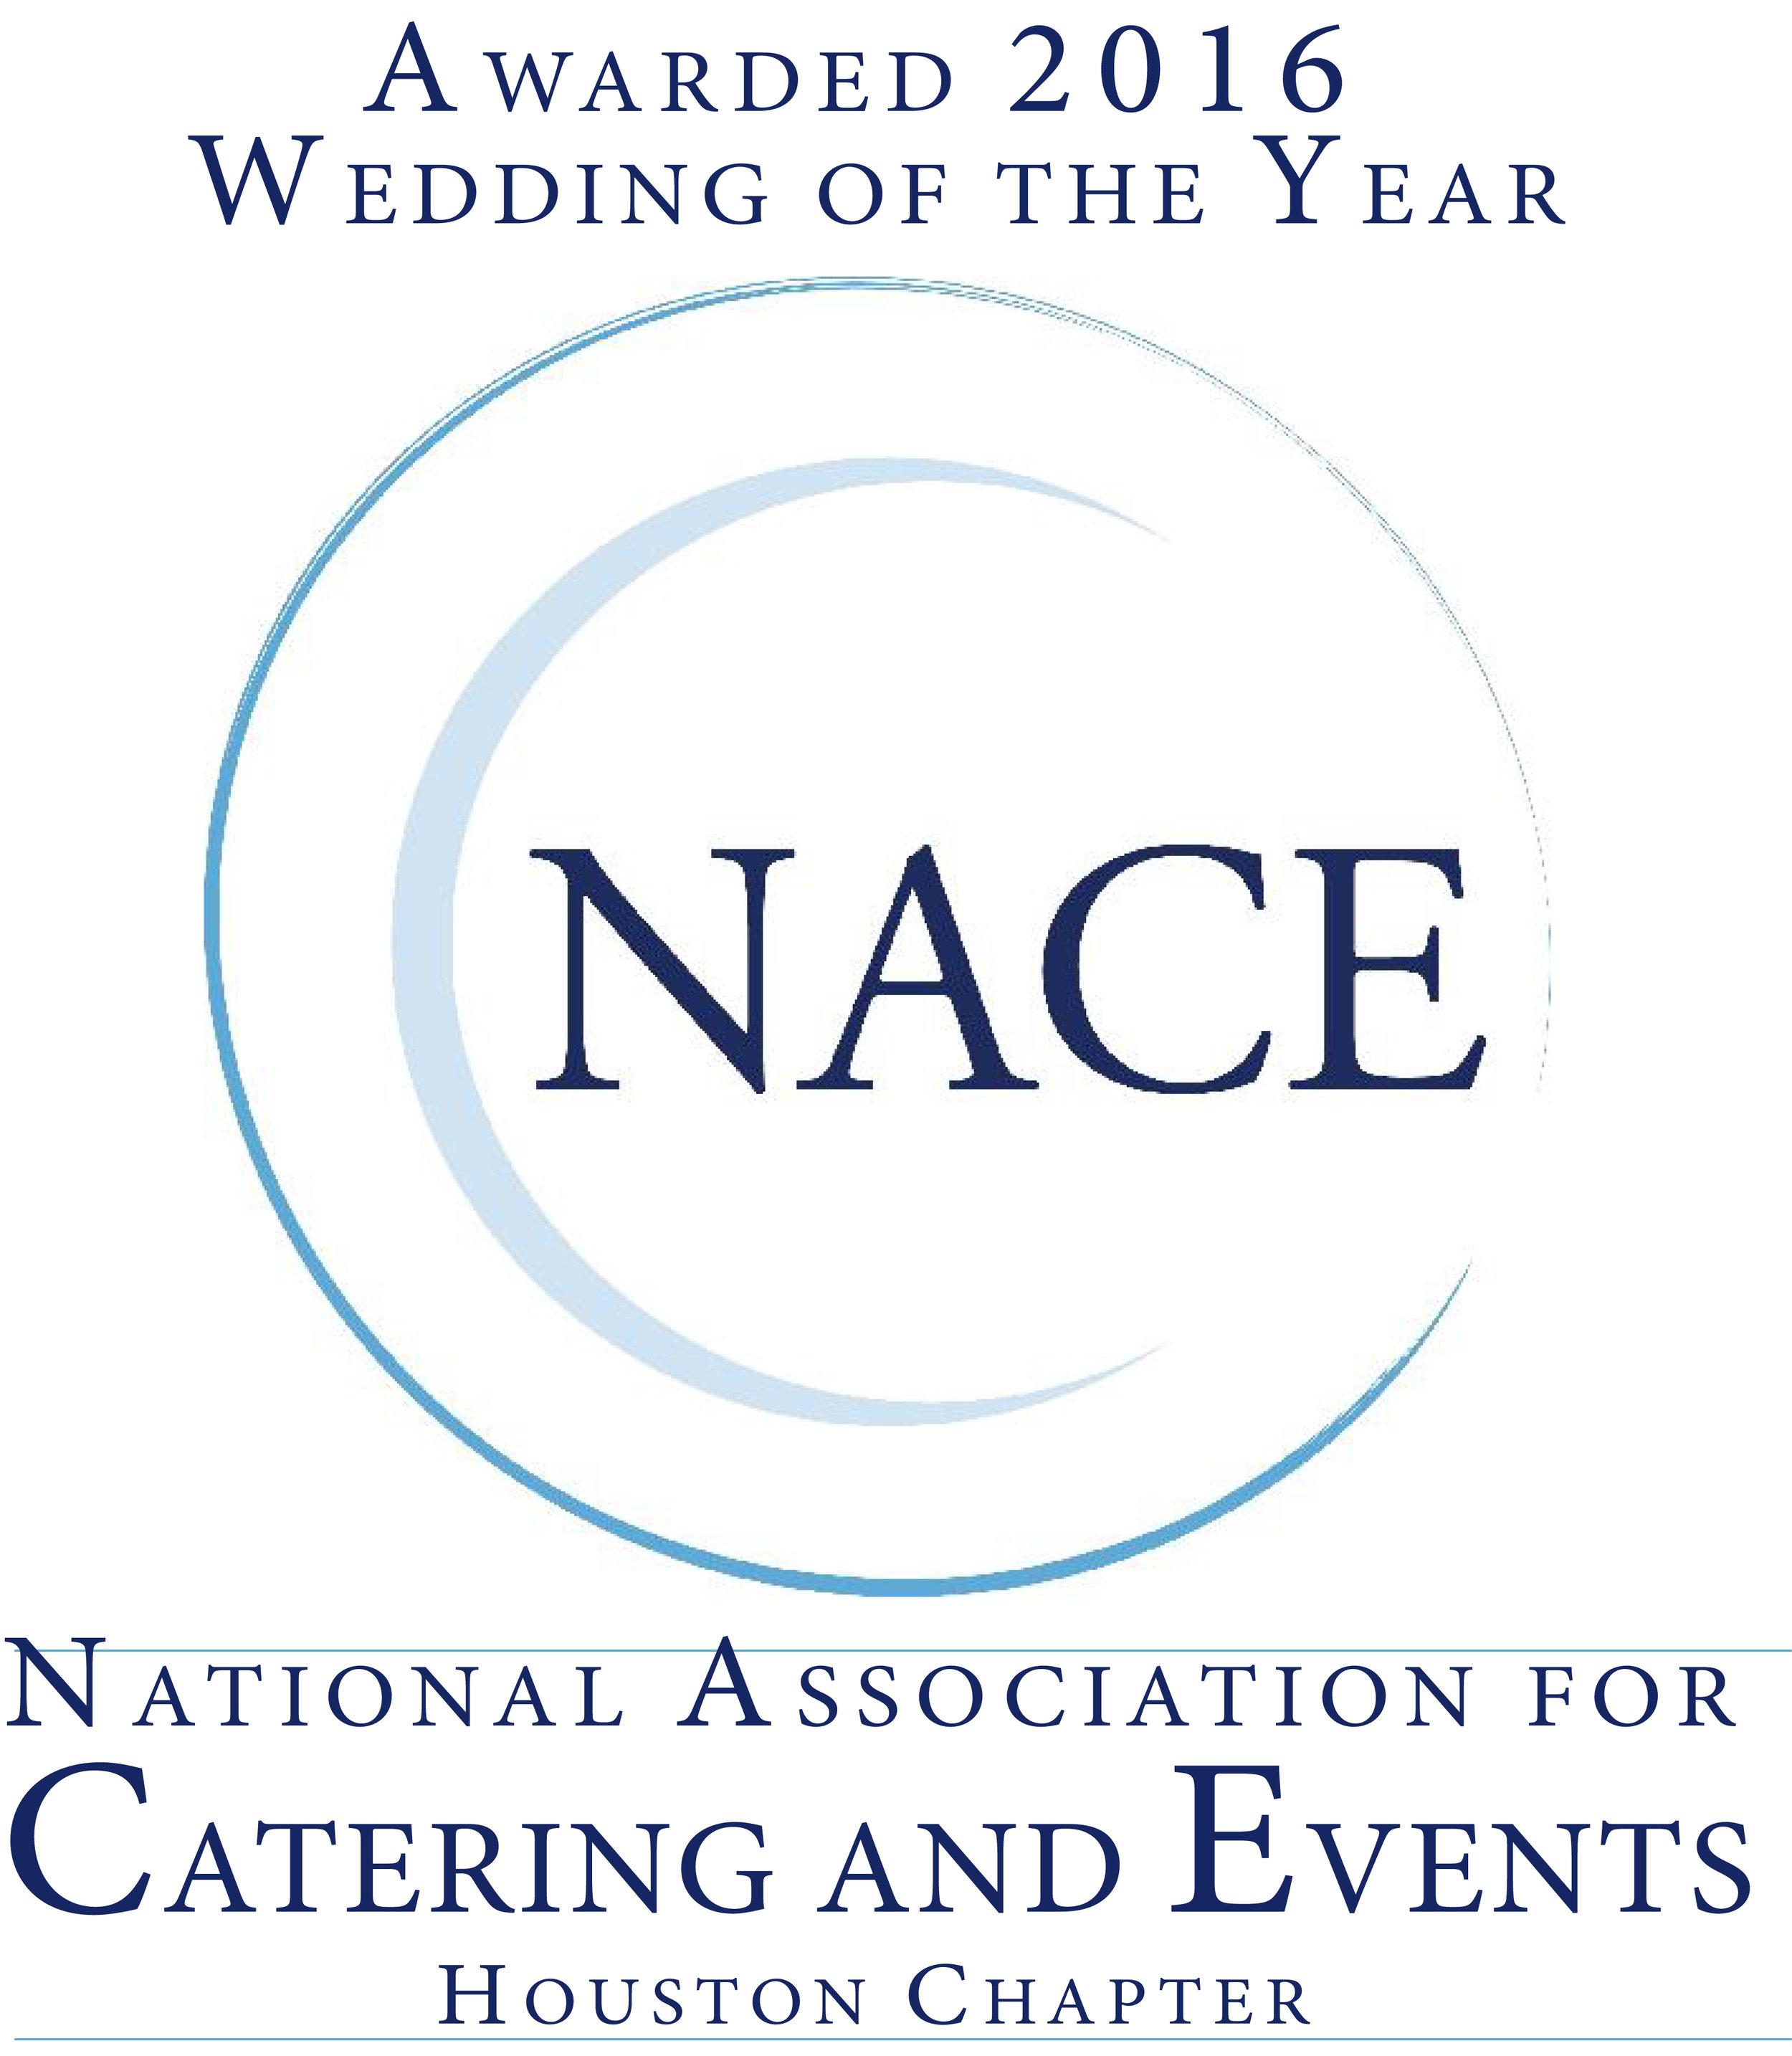 NACE Logo_Award Winner_Wedding_2016.jpg